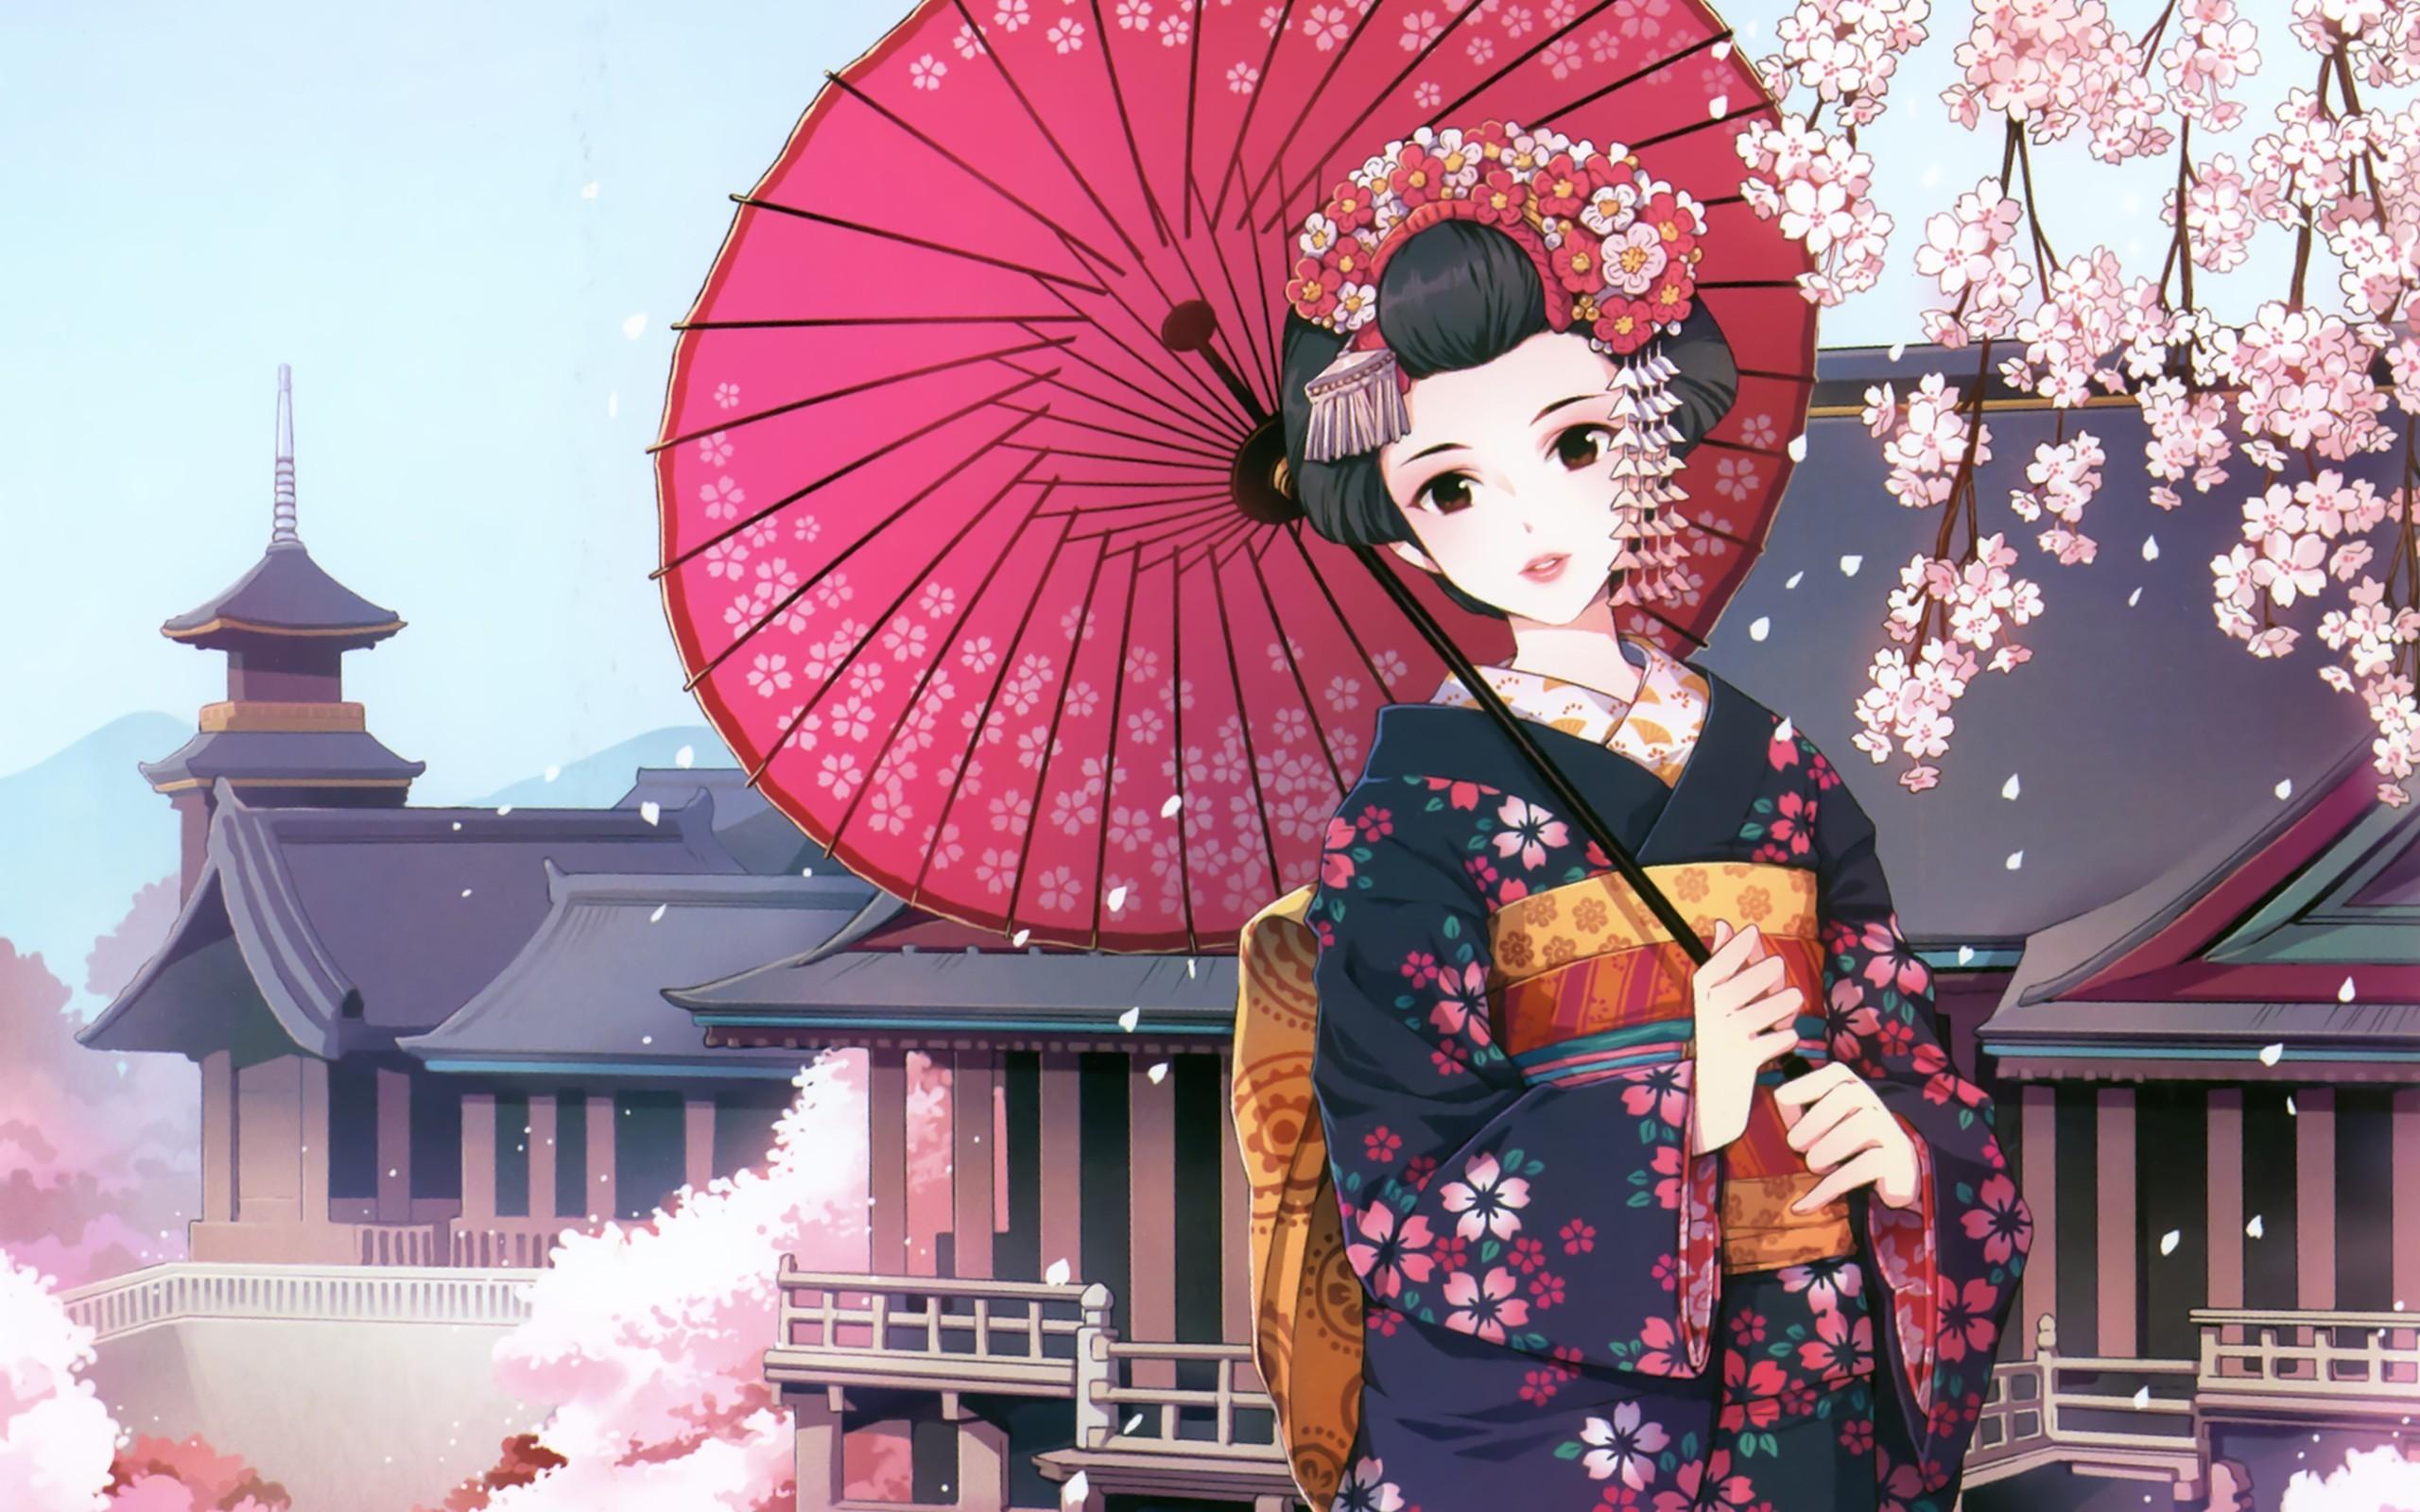 Res: 2560x1600, Cherry blossoms flowers kimono umbrellas flower petals japanese clothes  anime girls black hair nardack (artist) wallpaper |  | 16284 |  WallpaperUP